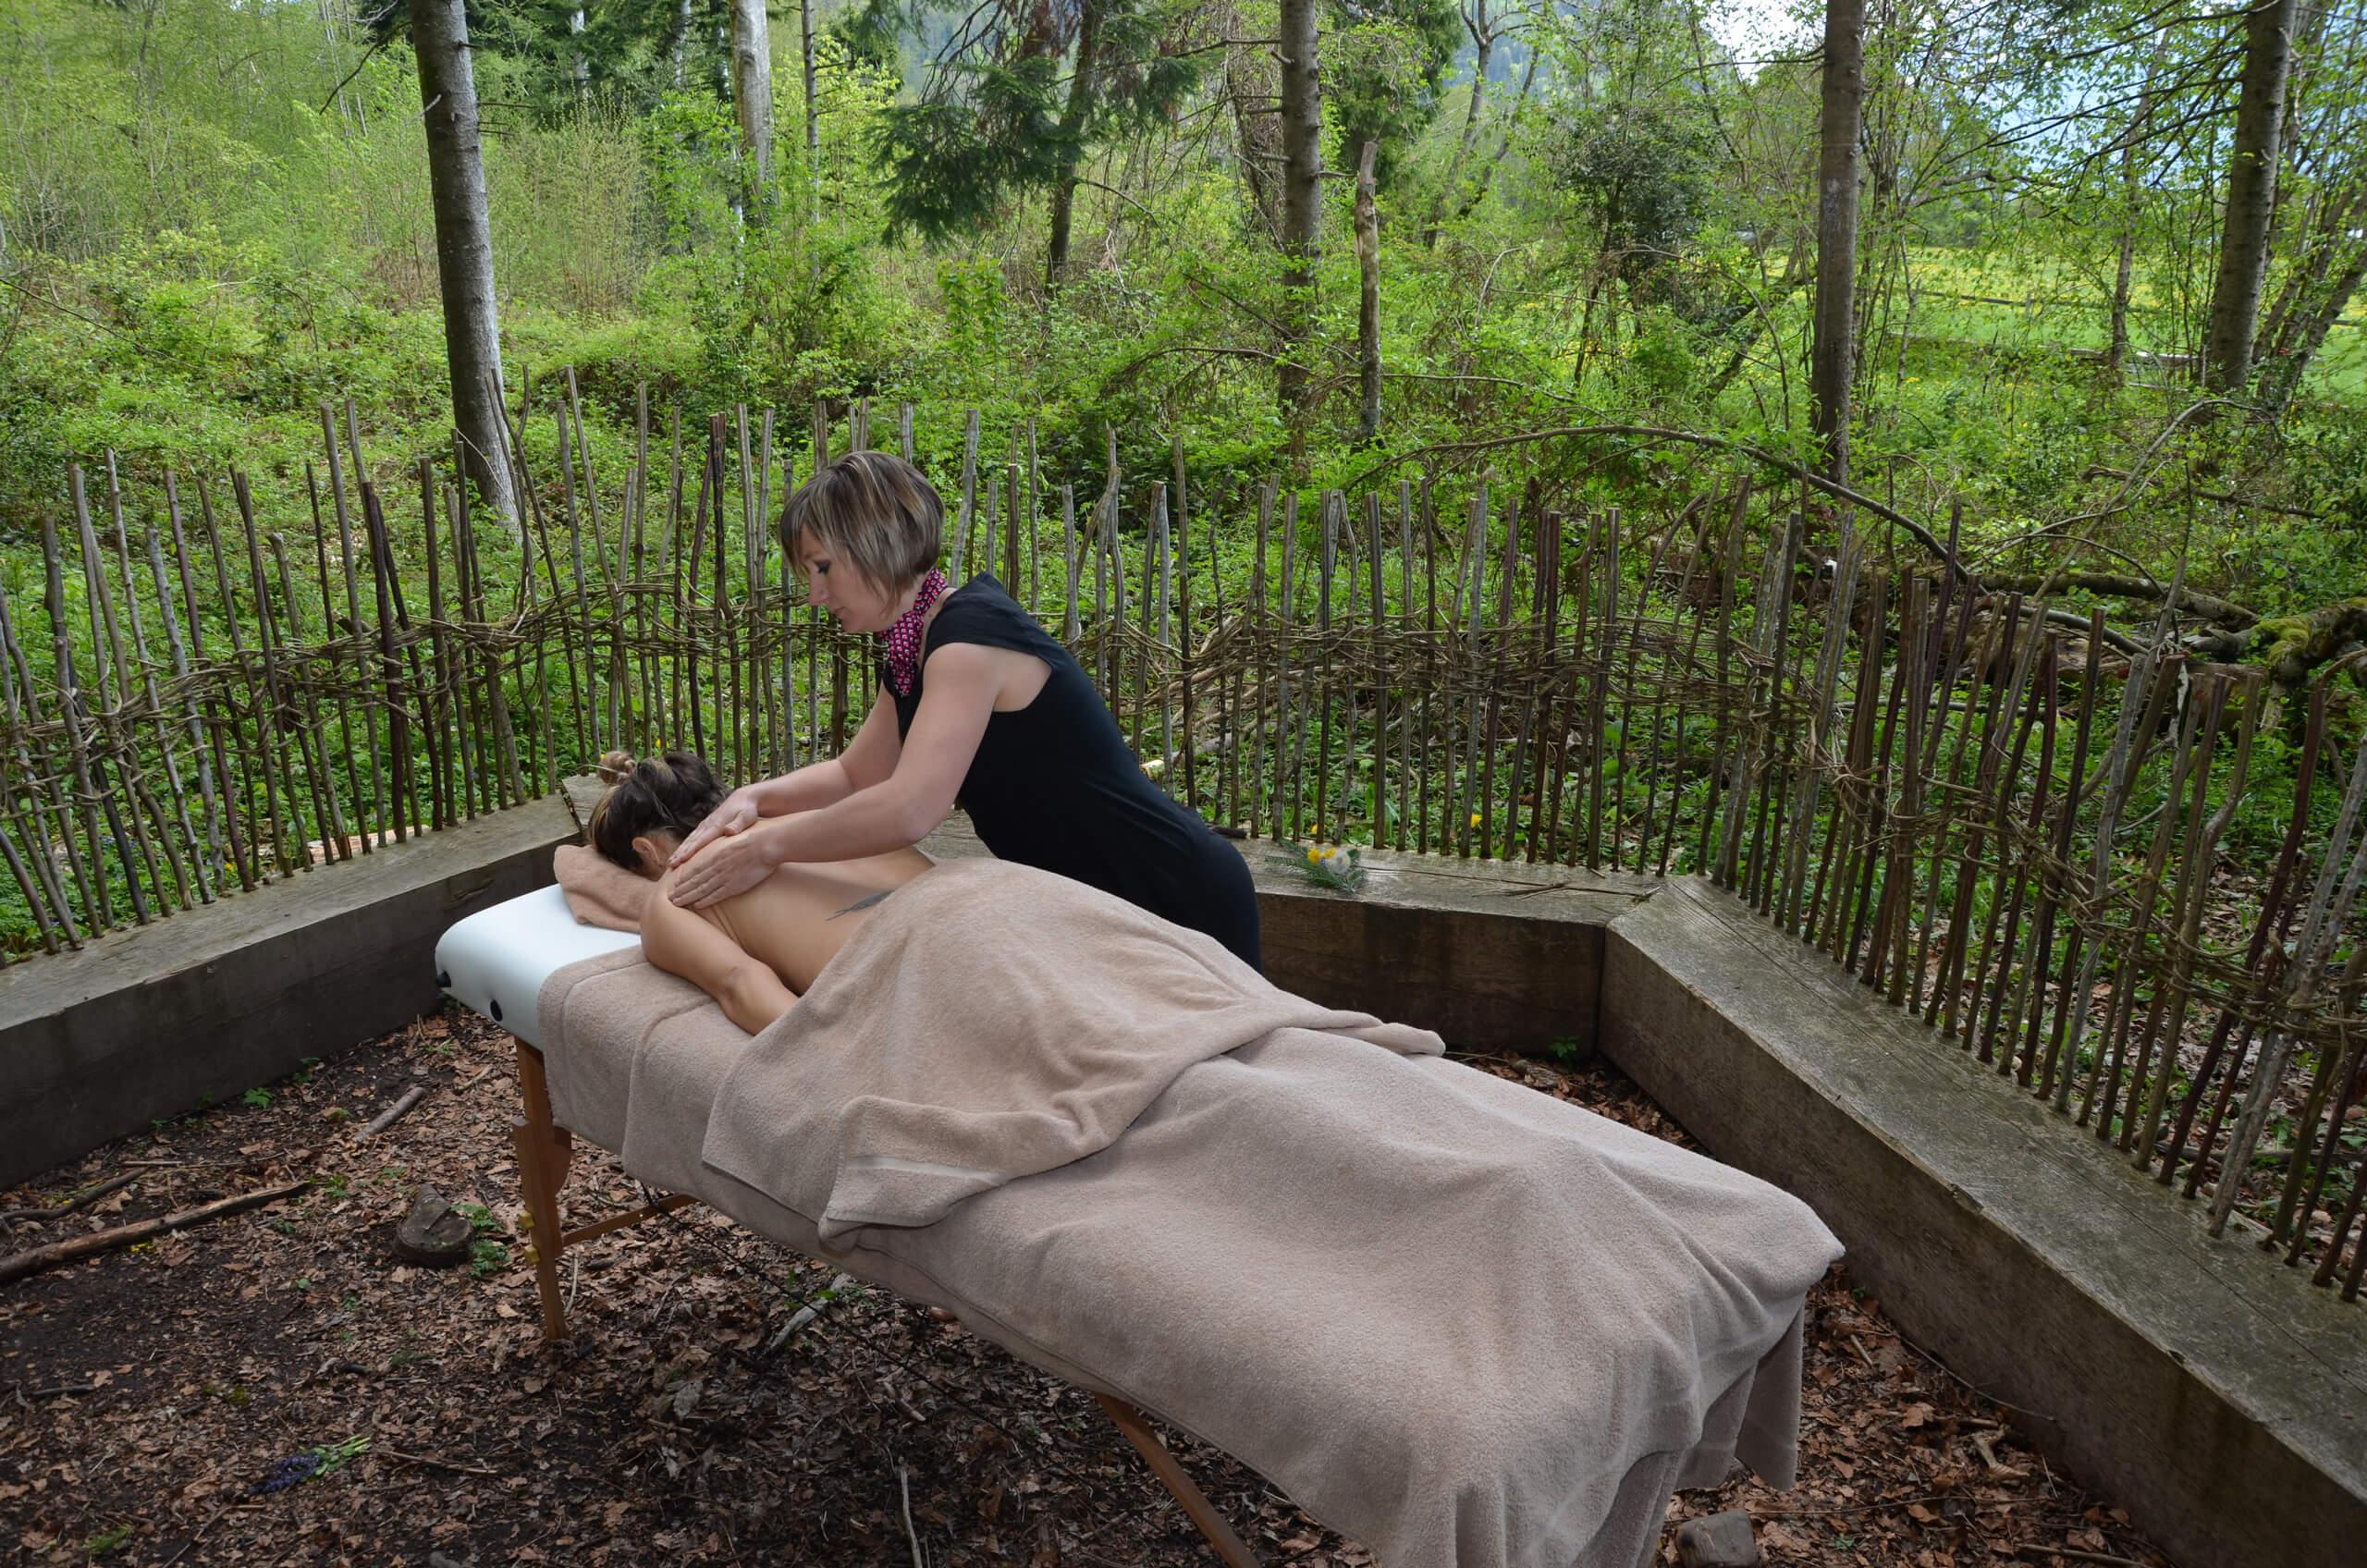 salzano-spa-waldmassage-outdoor